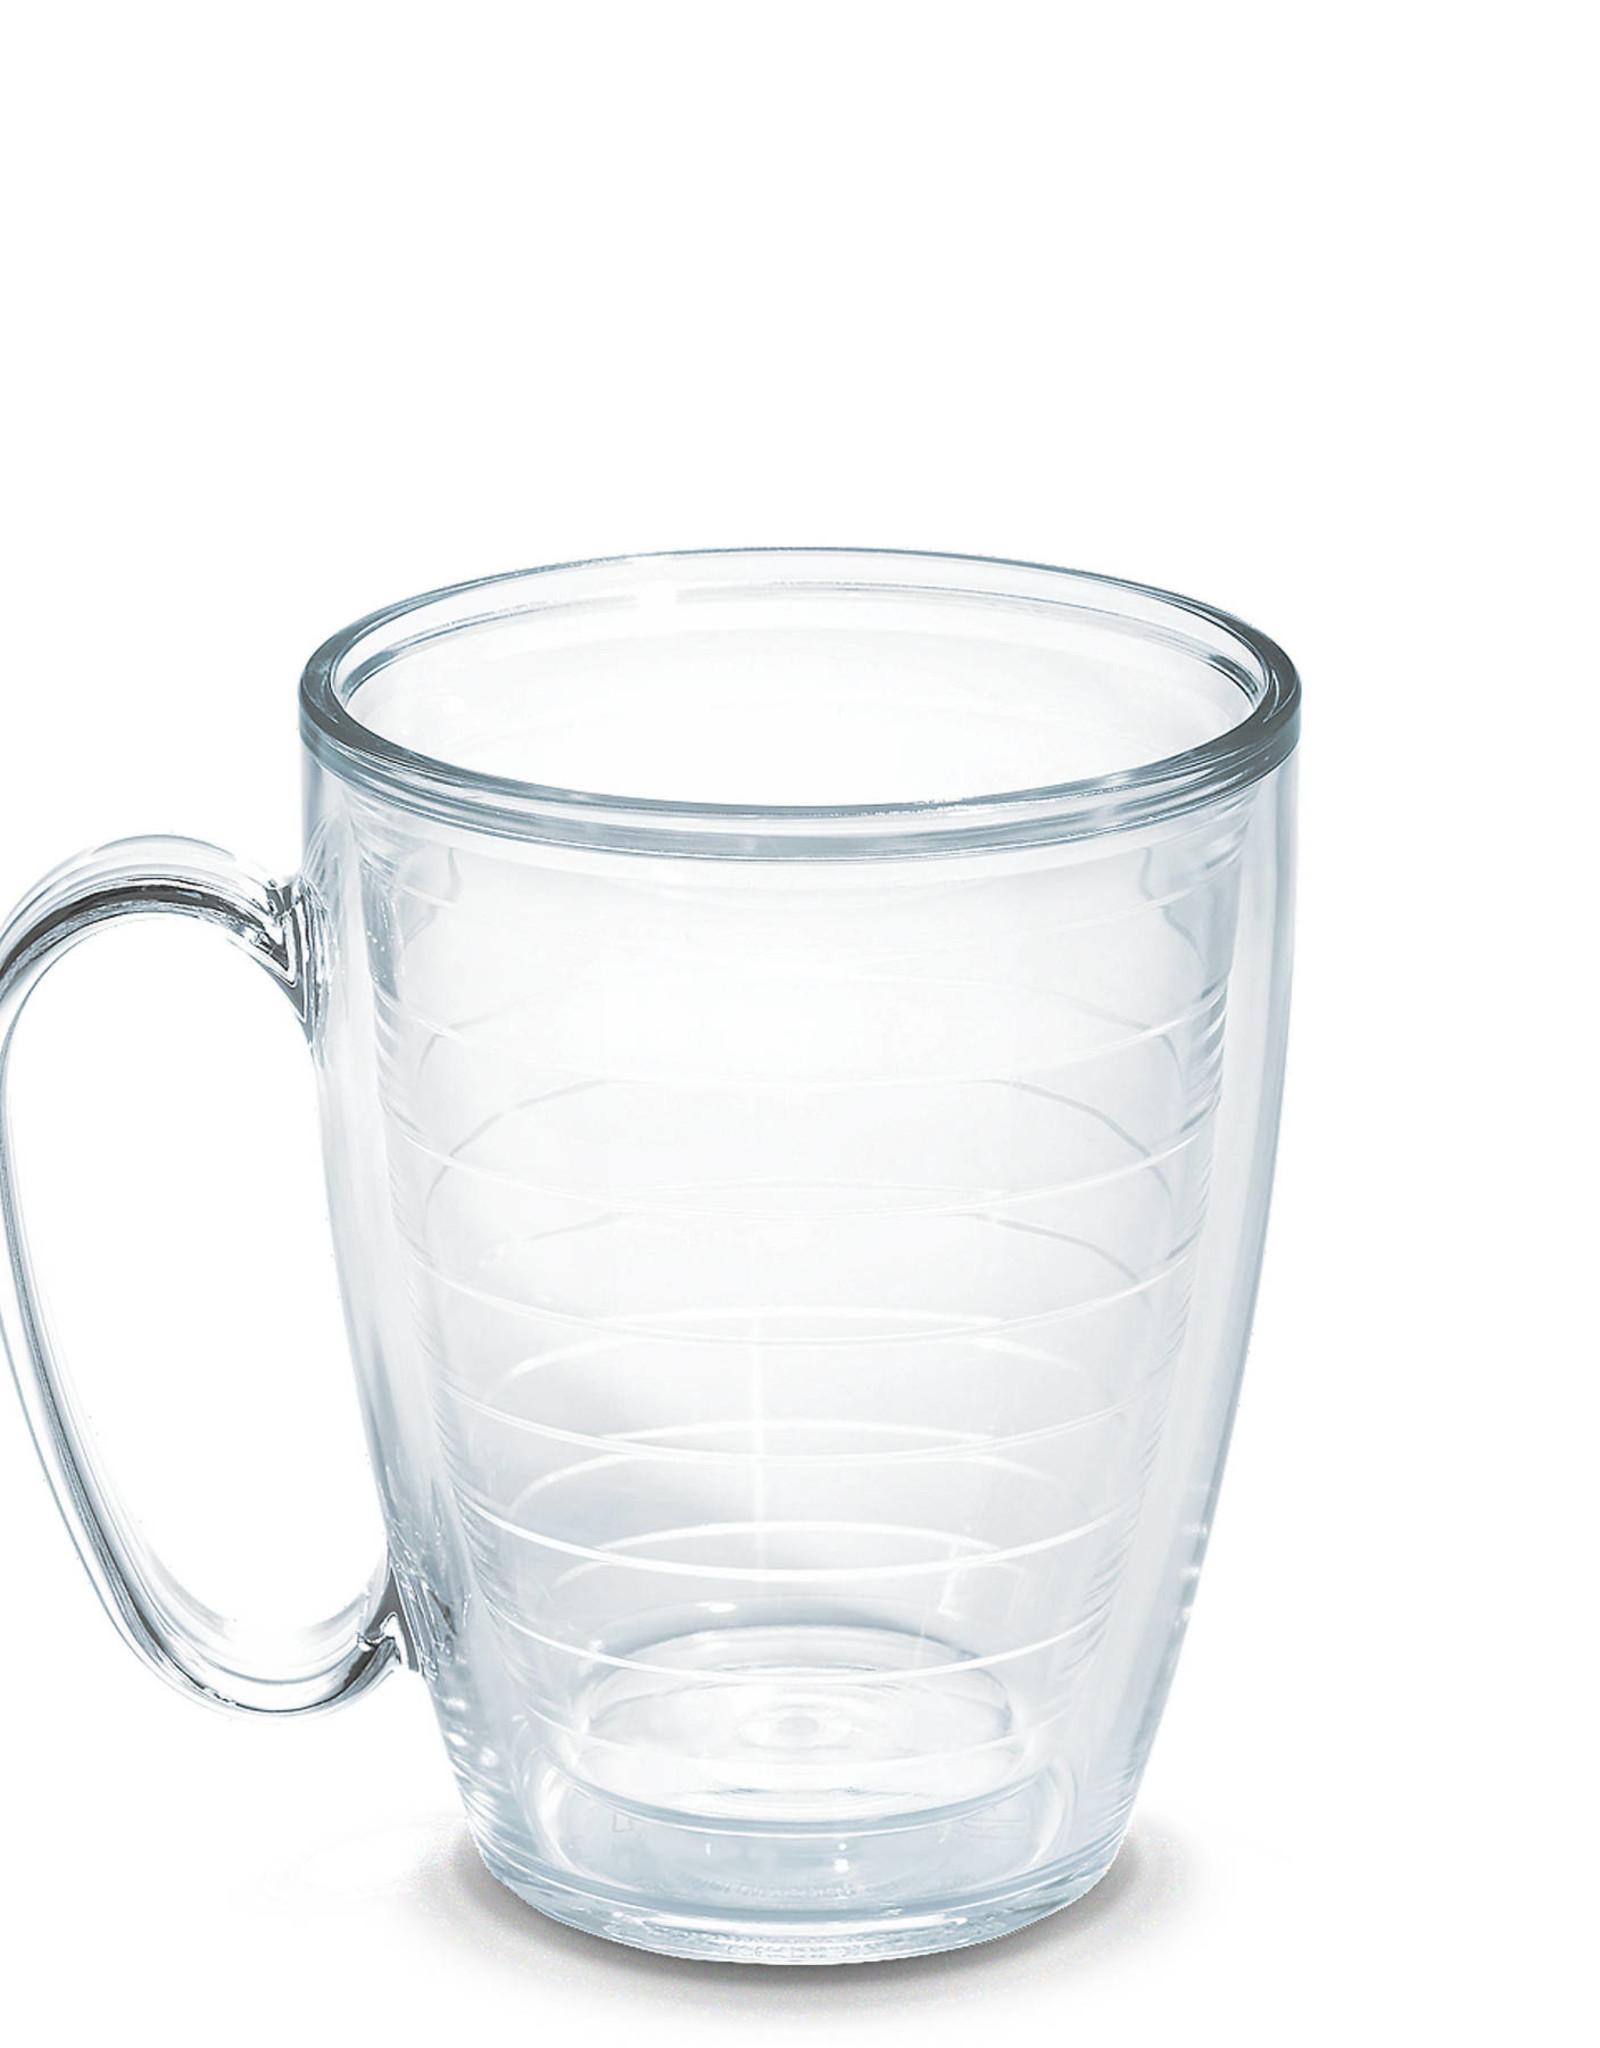 Tervis Tumbler 16oz Clear Mug